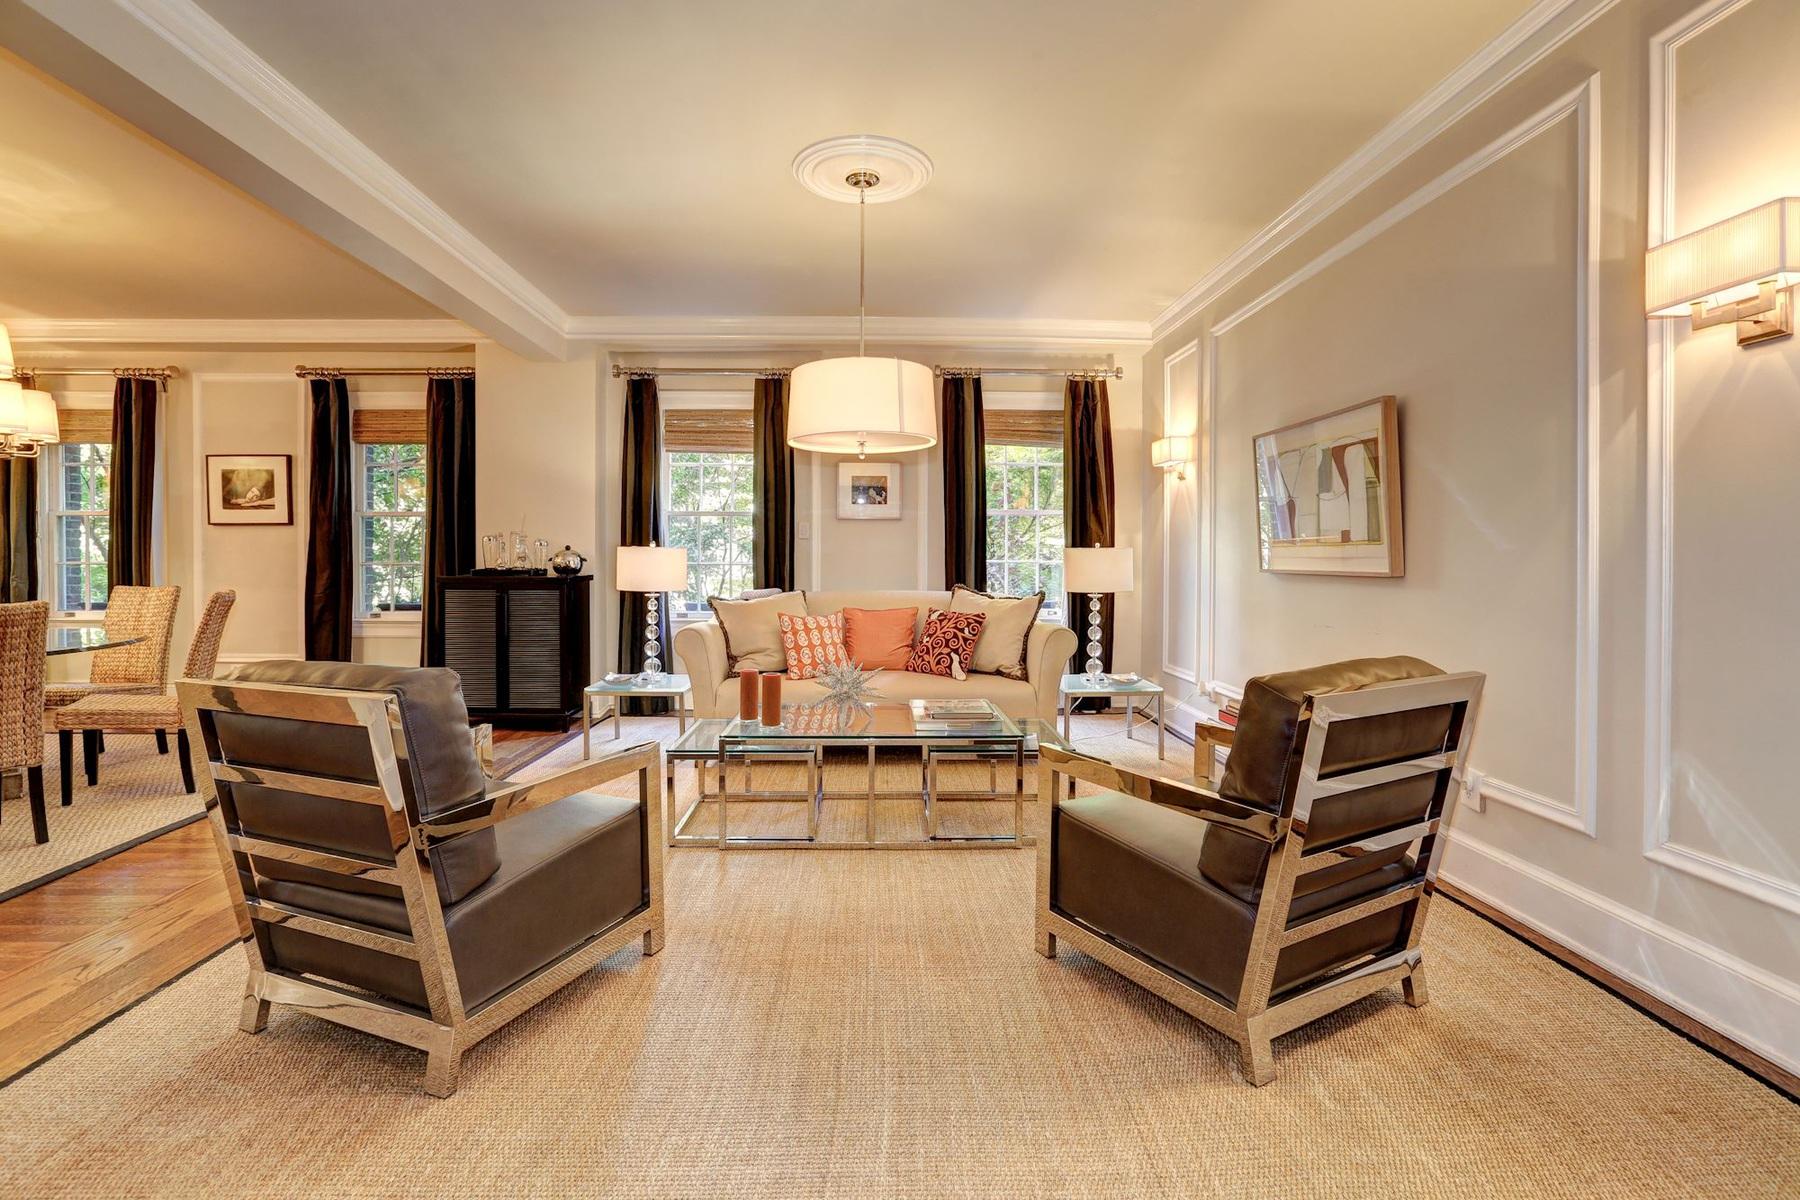 Additional photo for property listing at 1661 Crescent Place 210, Washington 1661 Crescent Pl 210 Washington, Округ Колумбия 20009 Соединенные Штаты